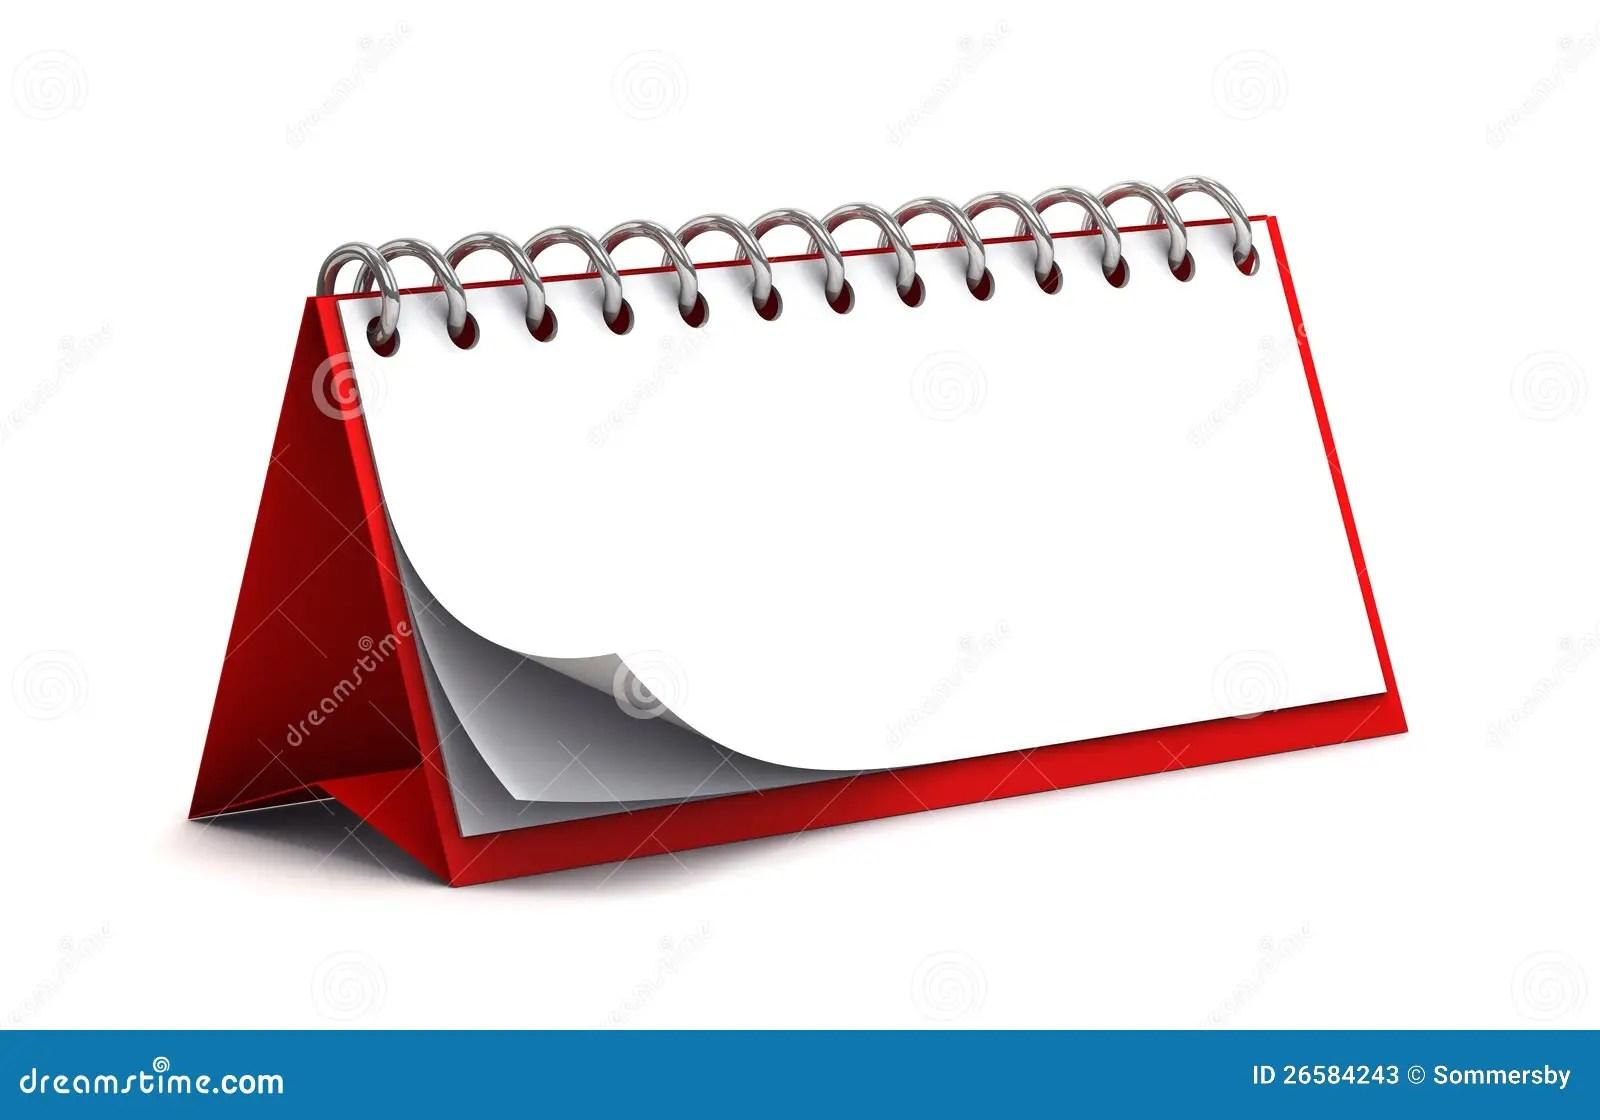 Blank Red Desk Paper Calendar Stock Photos  Image 26584243